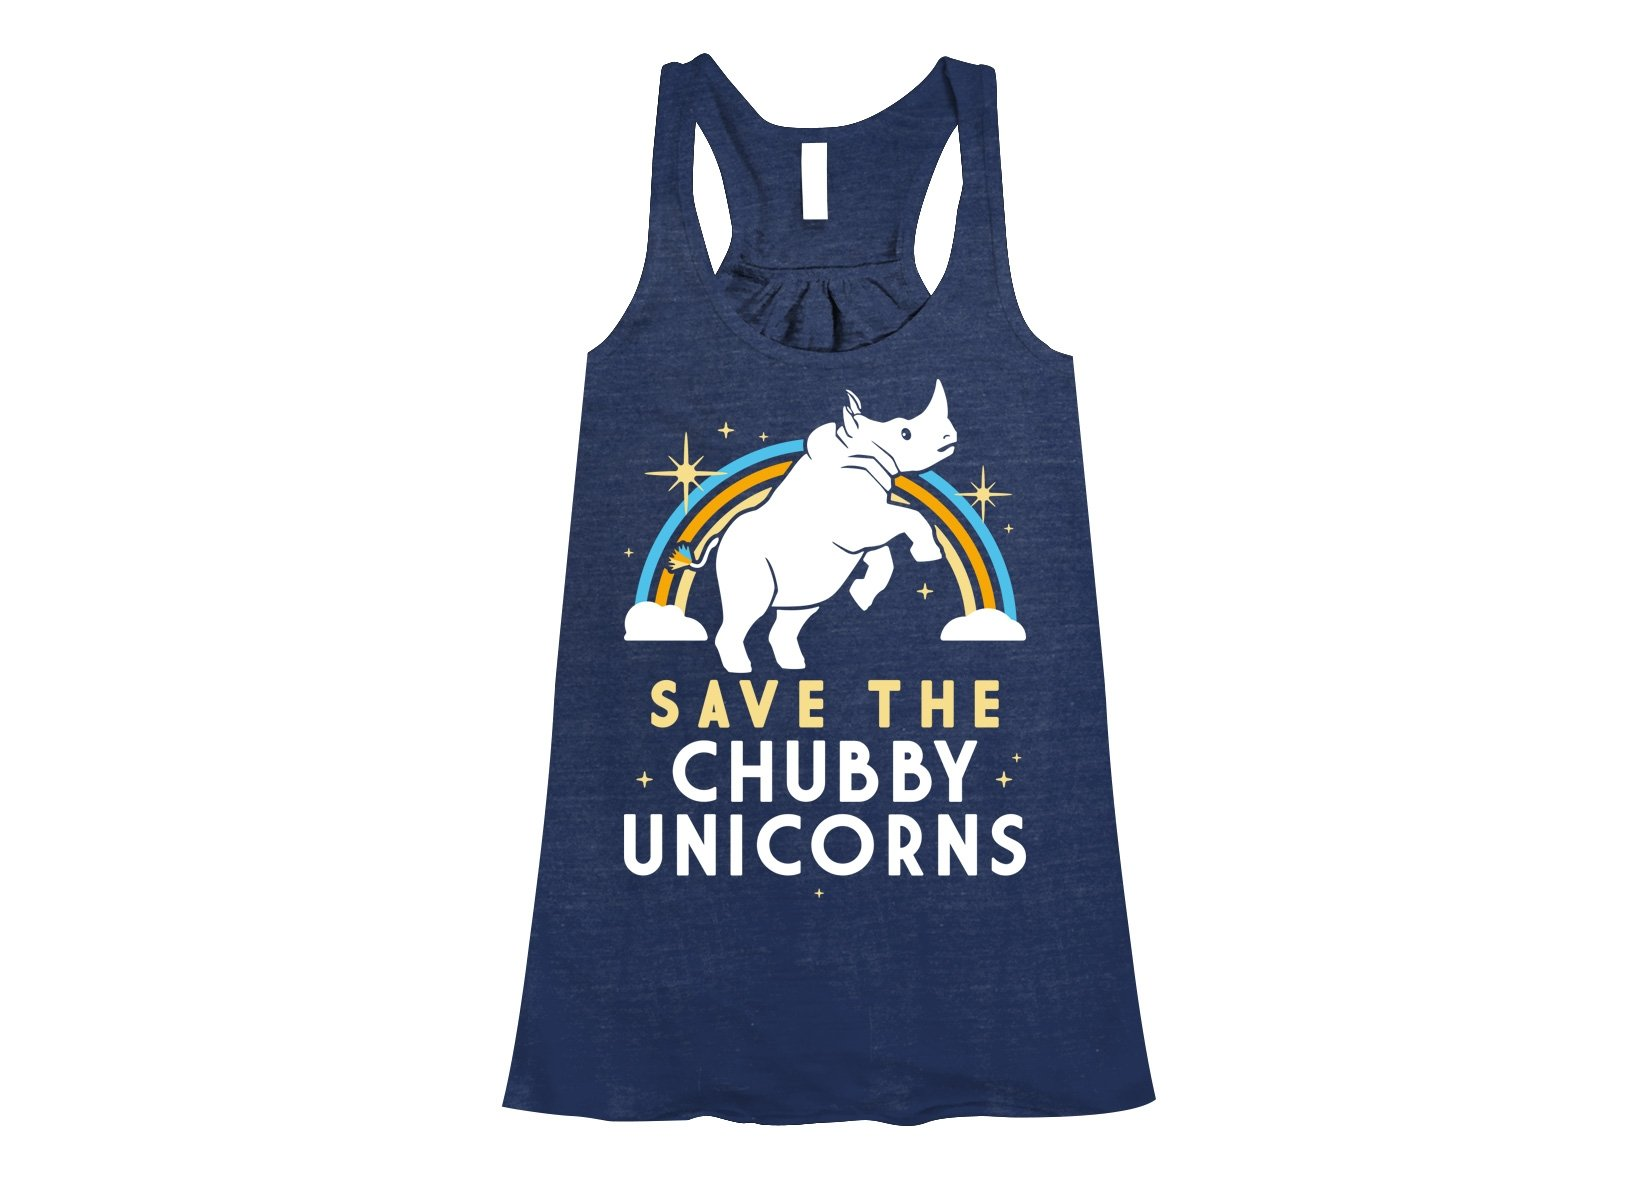 Save The Chubby Unicorns on Womens Tanks T-Shirt